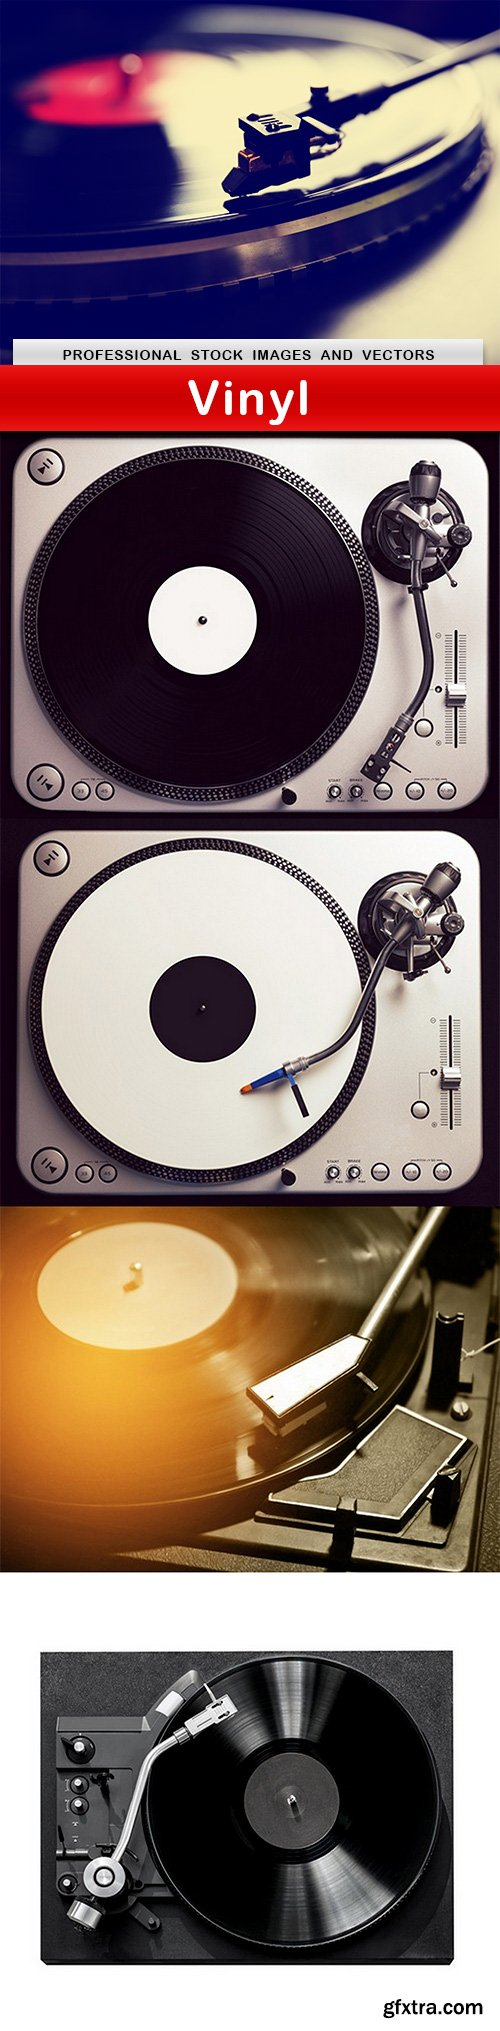 Vinyl - 5 UHQ JPEG